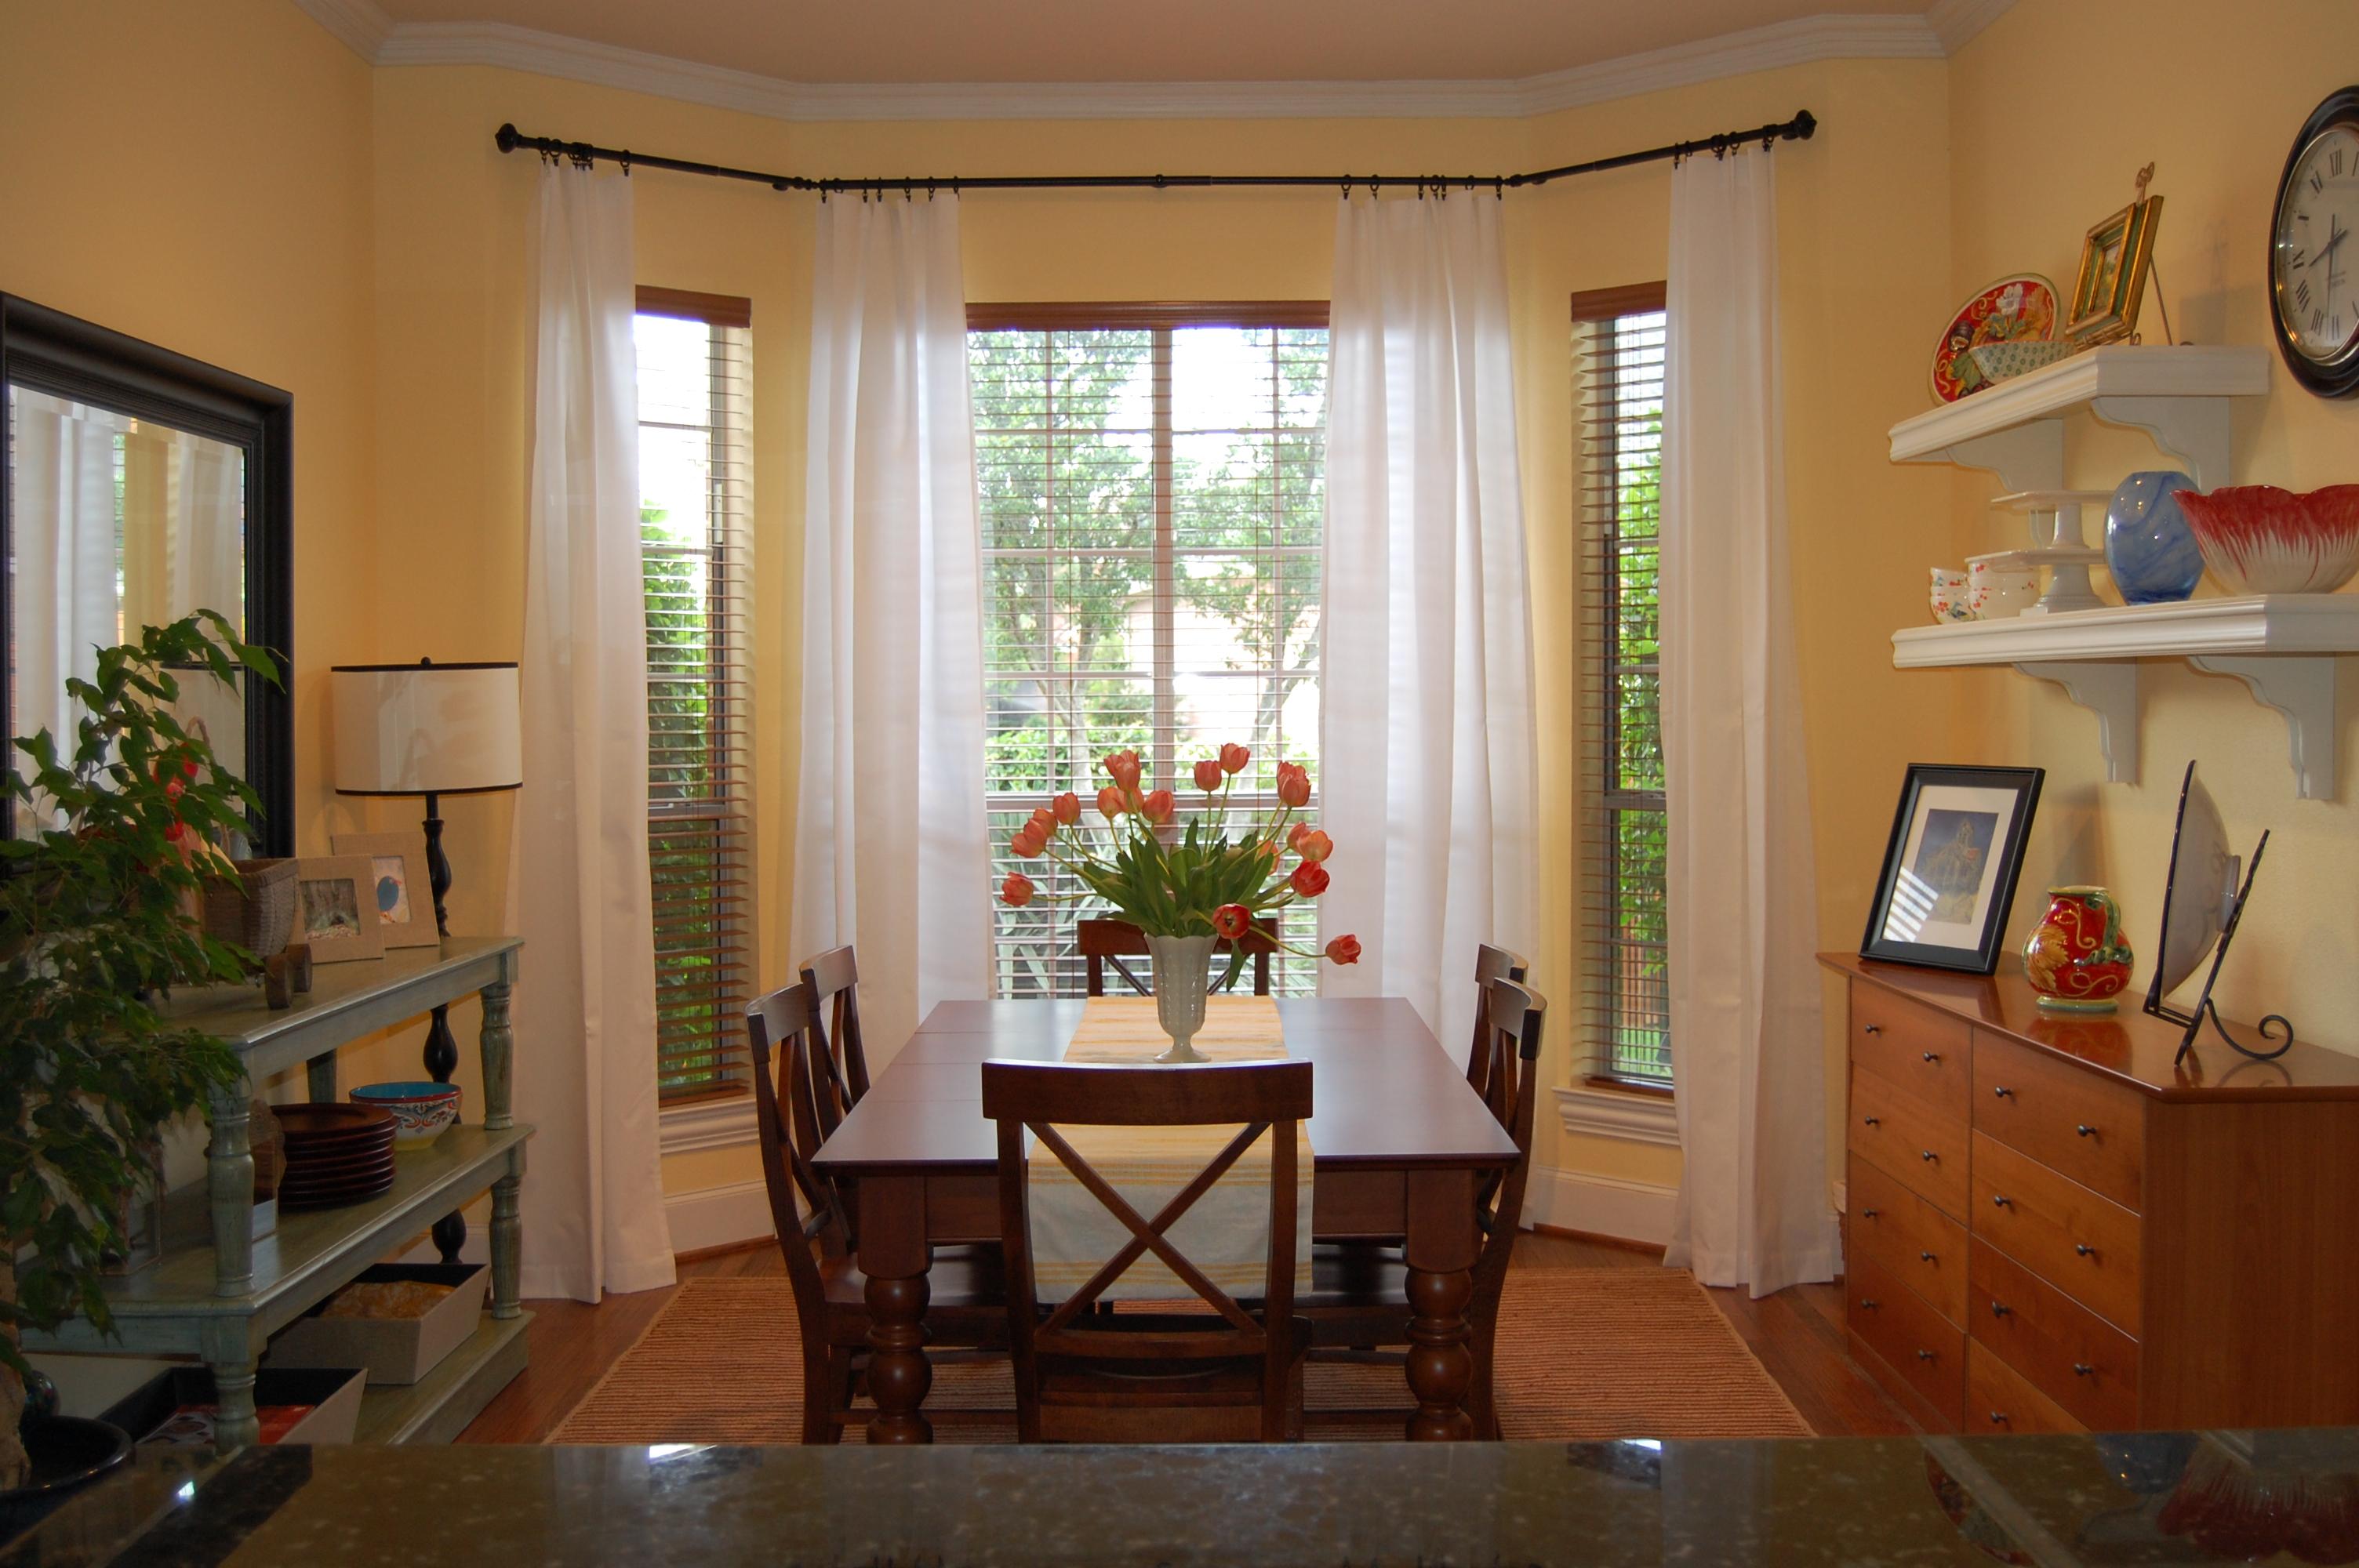 Window Treatments for Dining Room Ideas - HomesFeed on Dining Room Curtains Ideas  id=62474